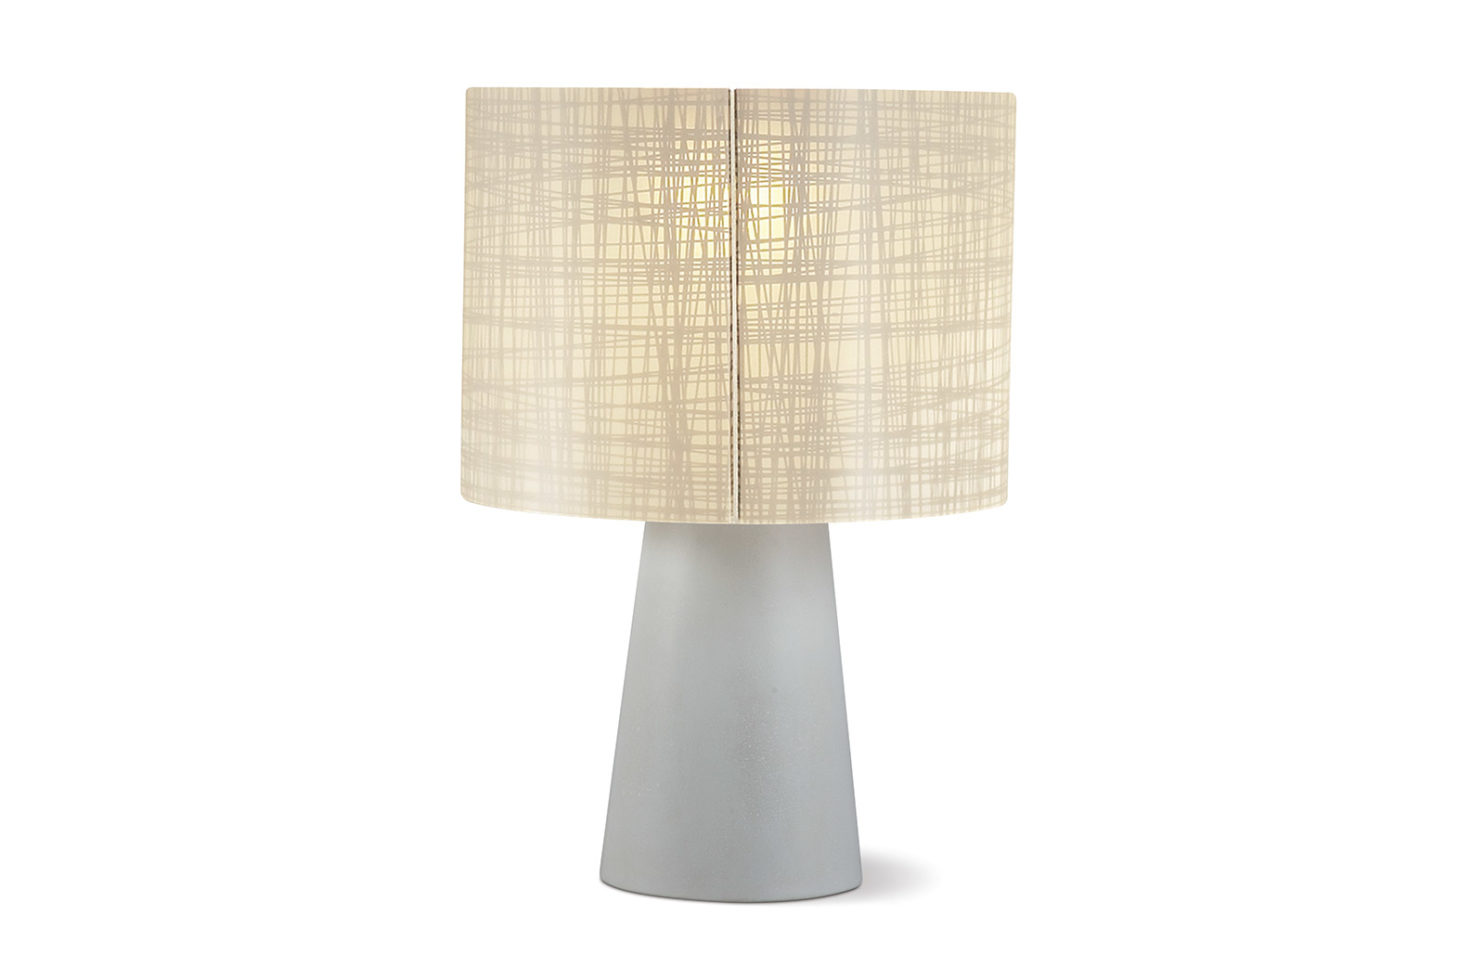 Inda Concrete Table 501LT002P2WL on